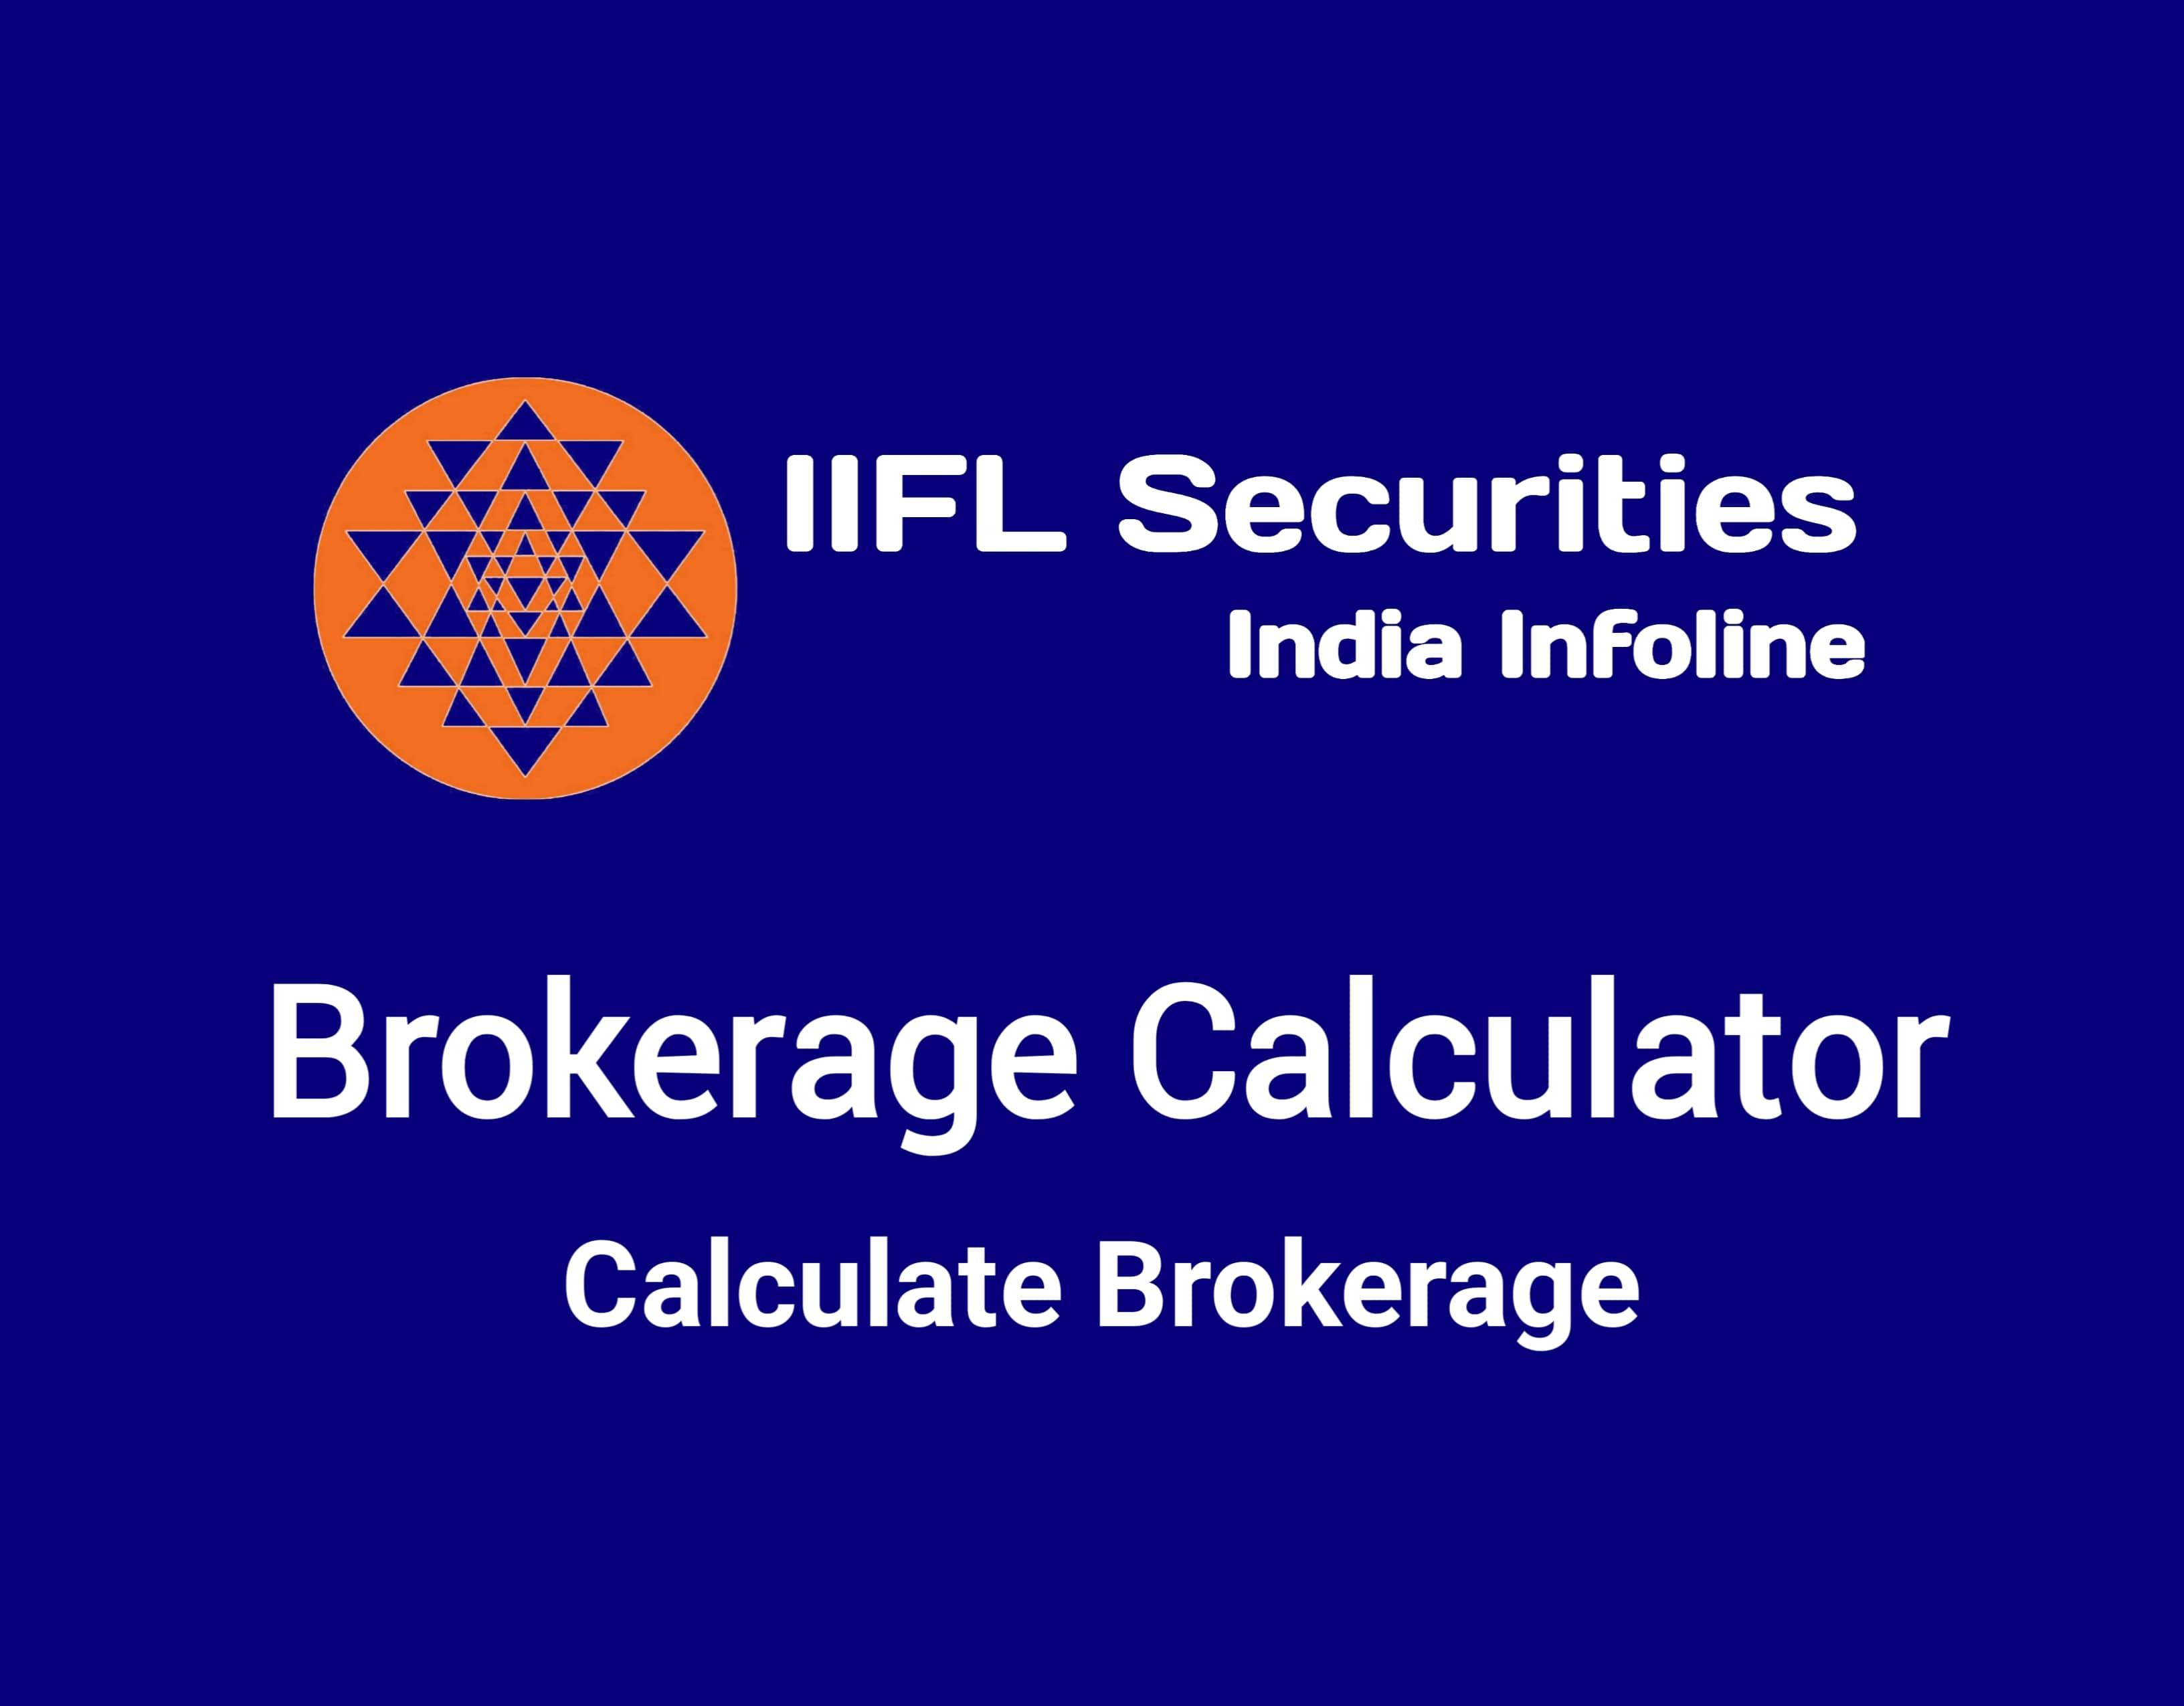 IIFL Brokerage Calculator